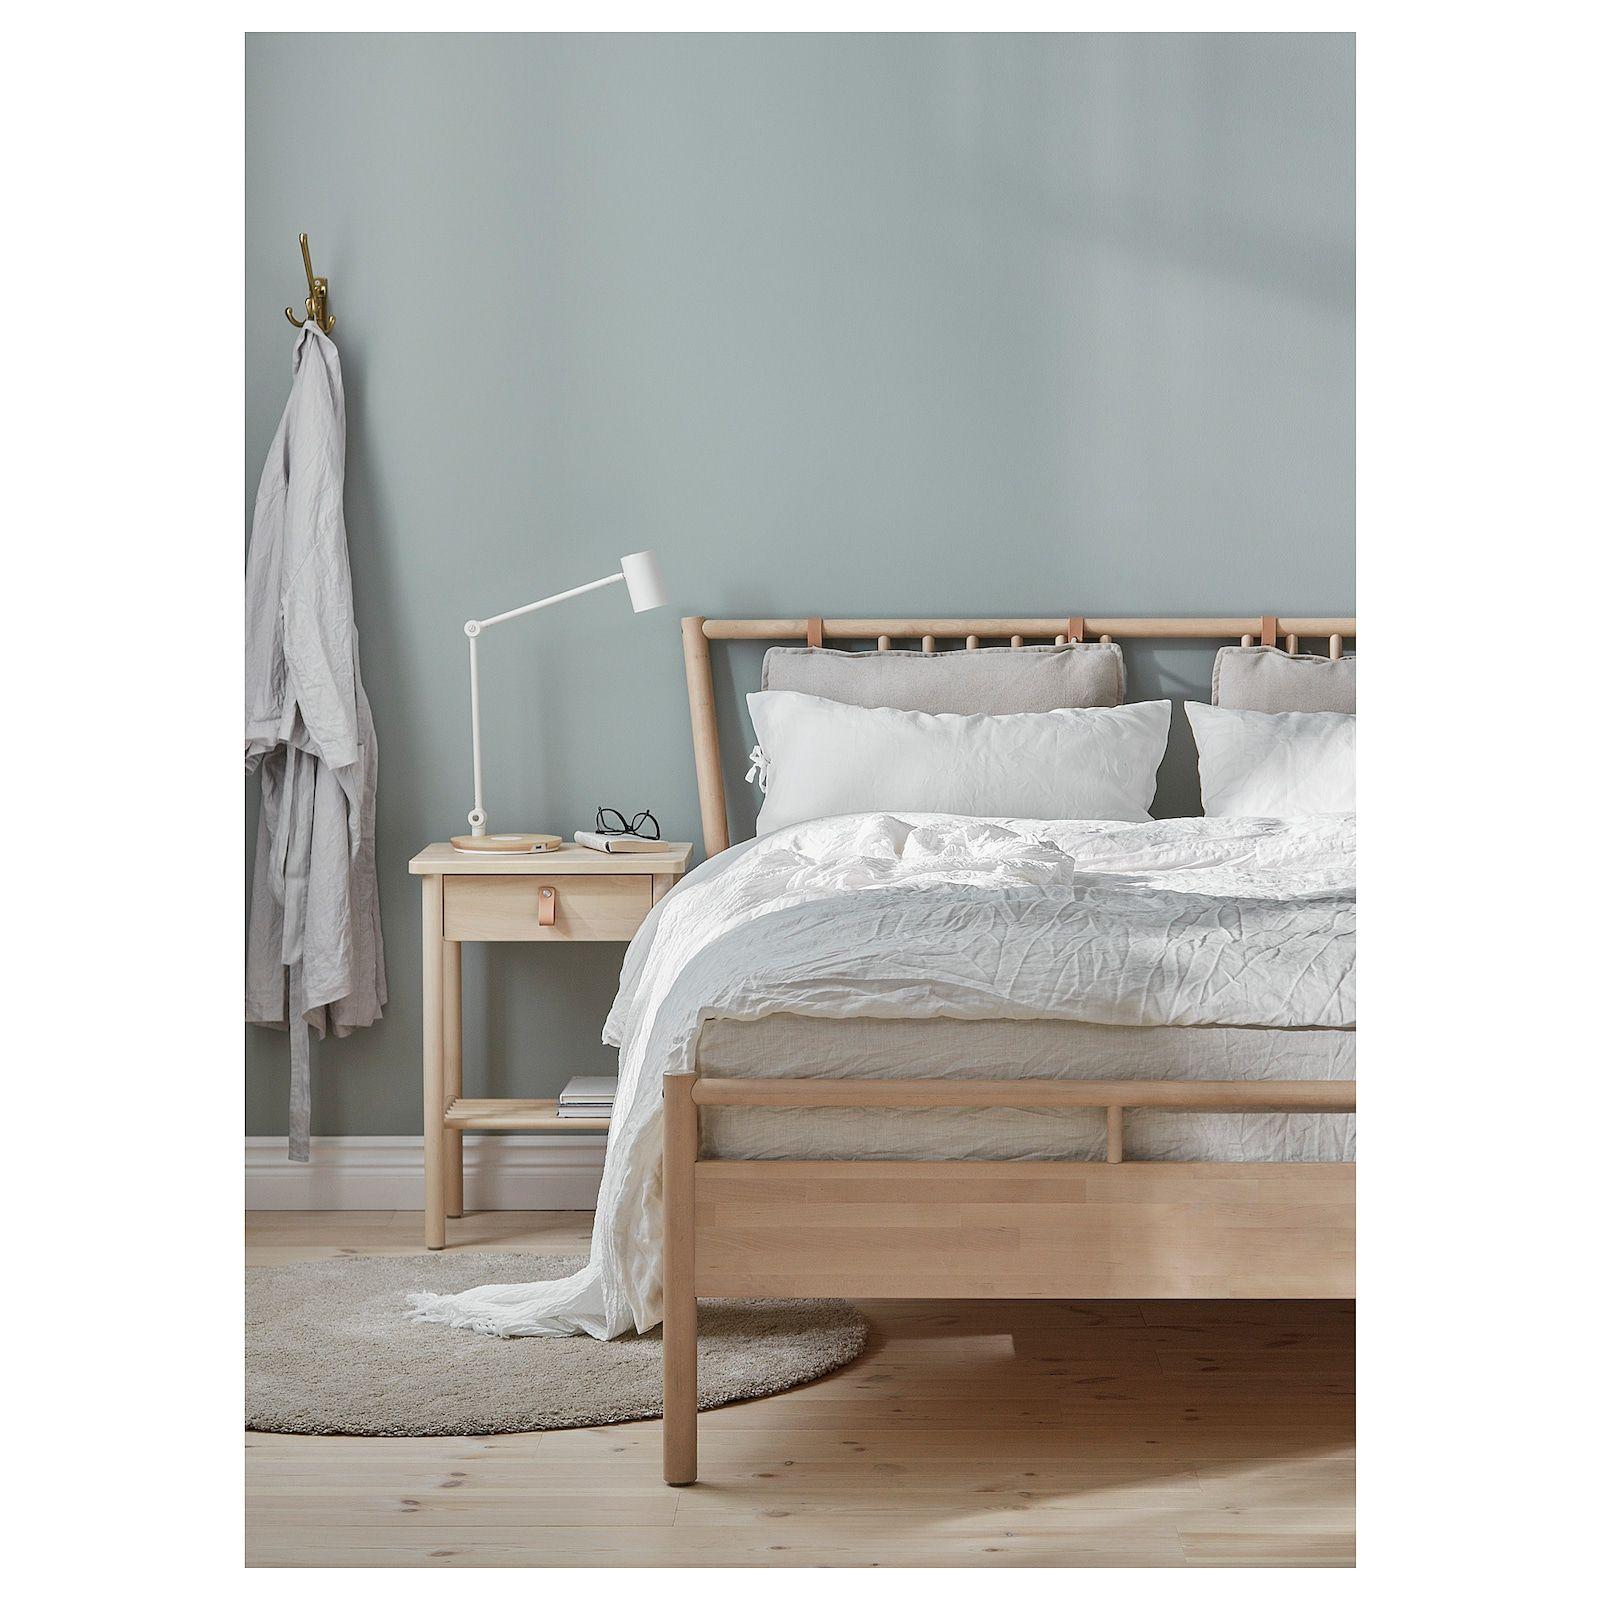 Bjorksnas Bettgestell Birke Lonset Ikea Deutschland In 2020 Verstellbare Betten Bettgestell Altes Bettgestell